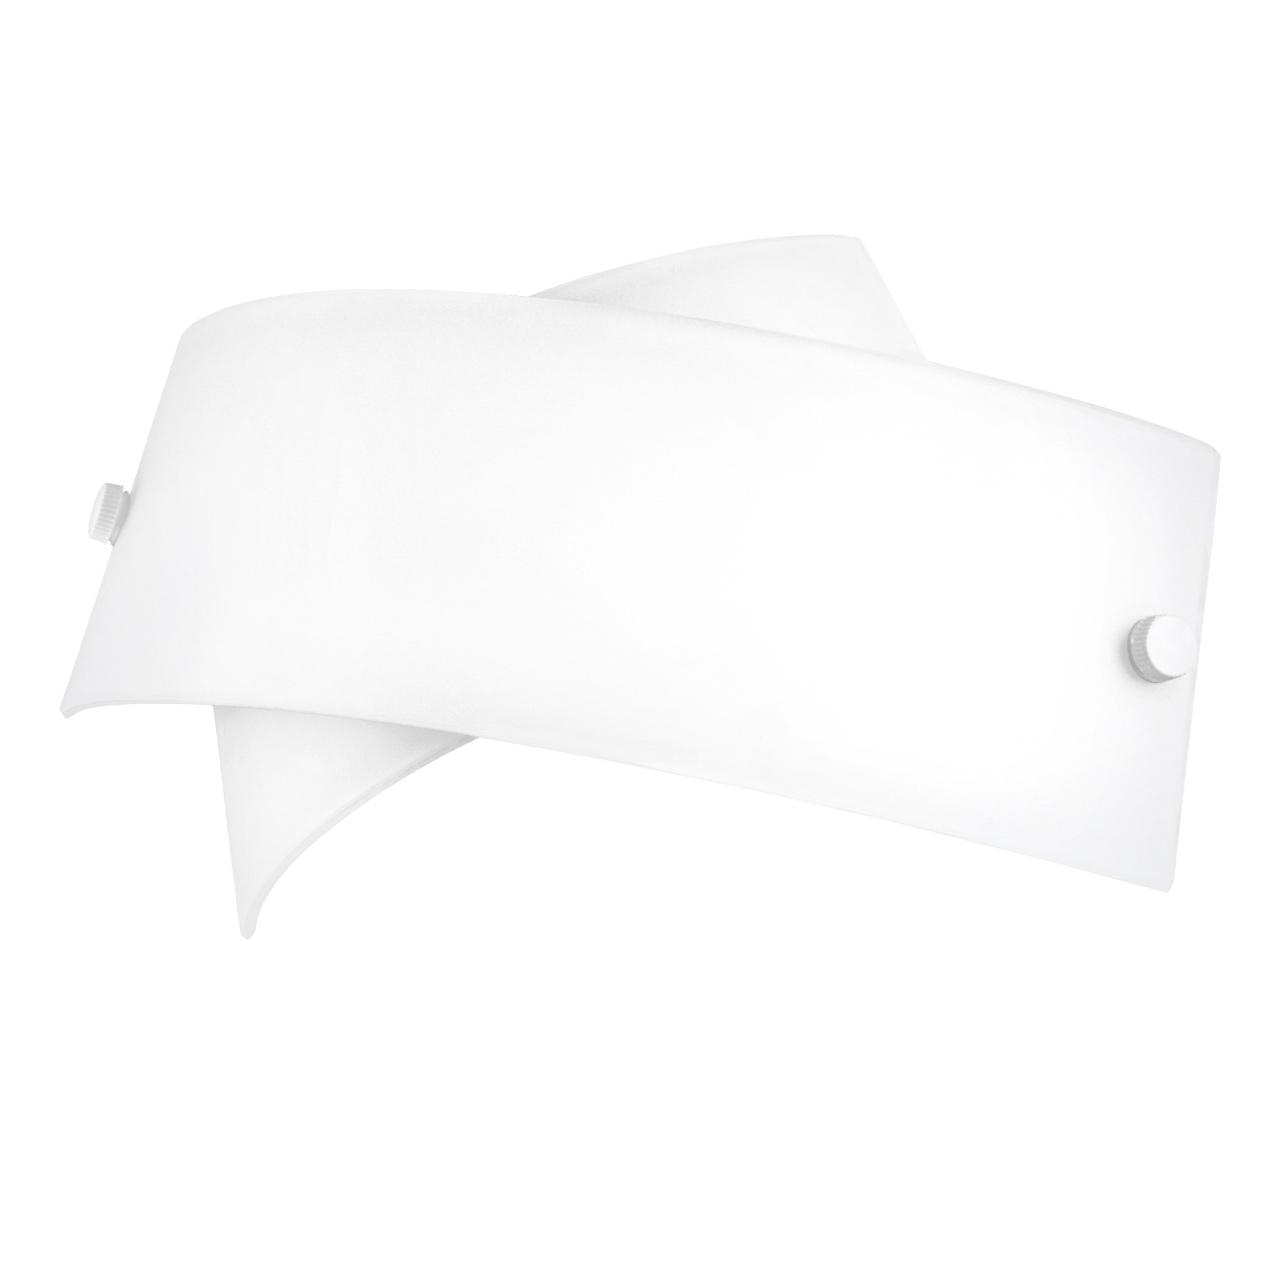 Бра Virata 1х75W R7s белый Lightstar 805600